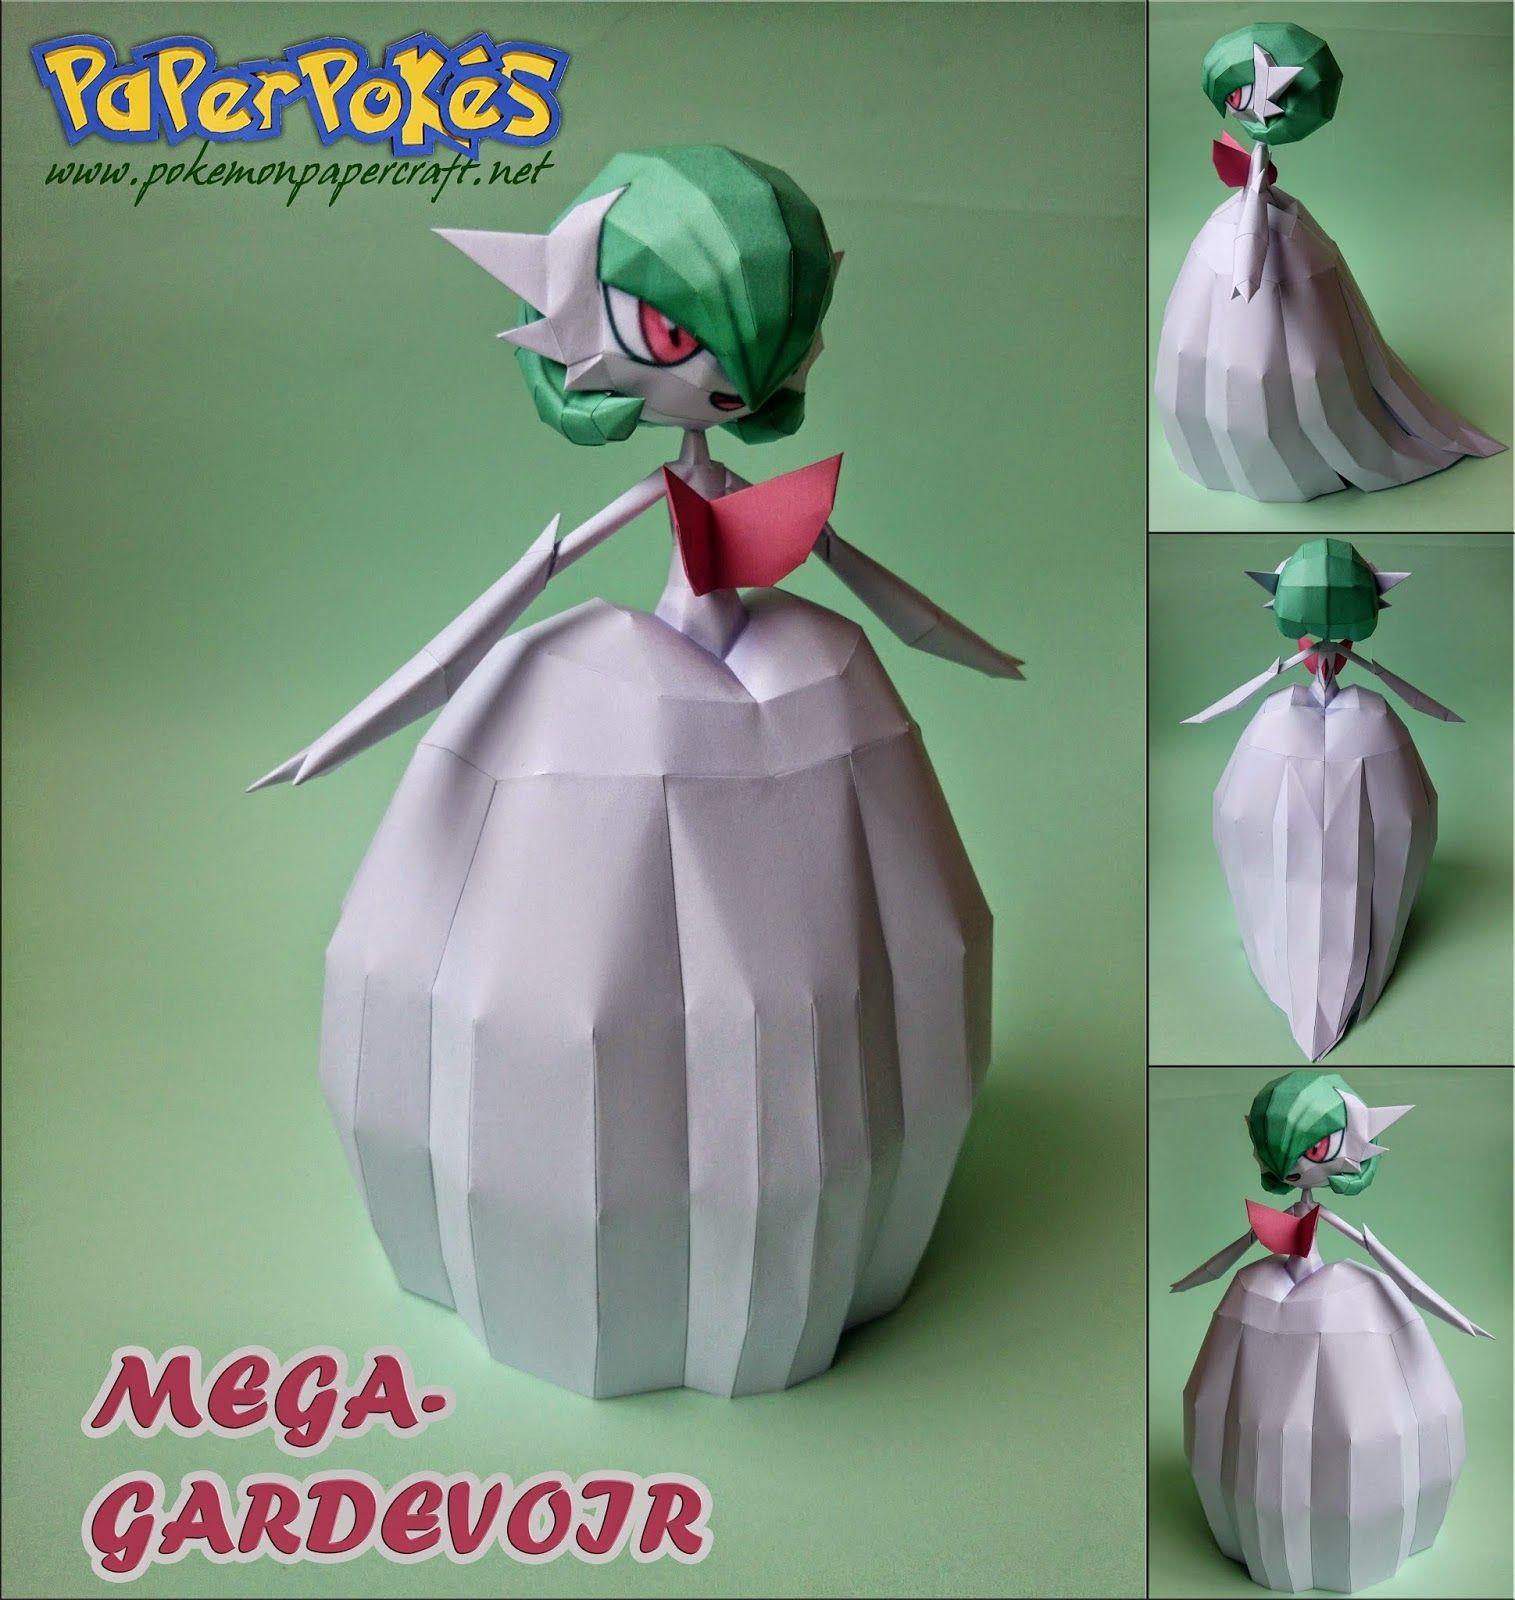 Eevee Papercraft Paperpokés Pokémon Papercrafts Mega Gardevoir